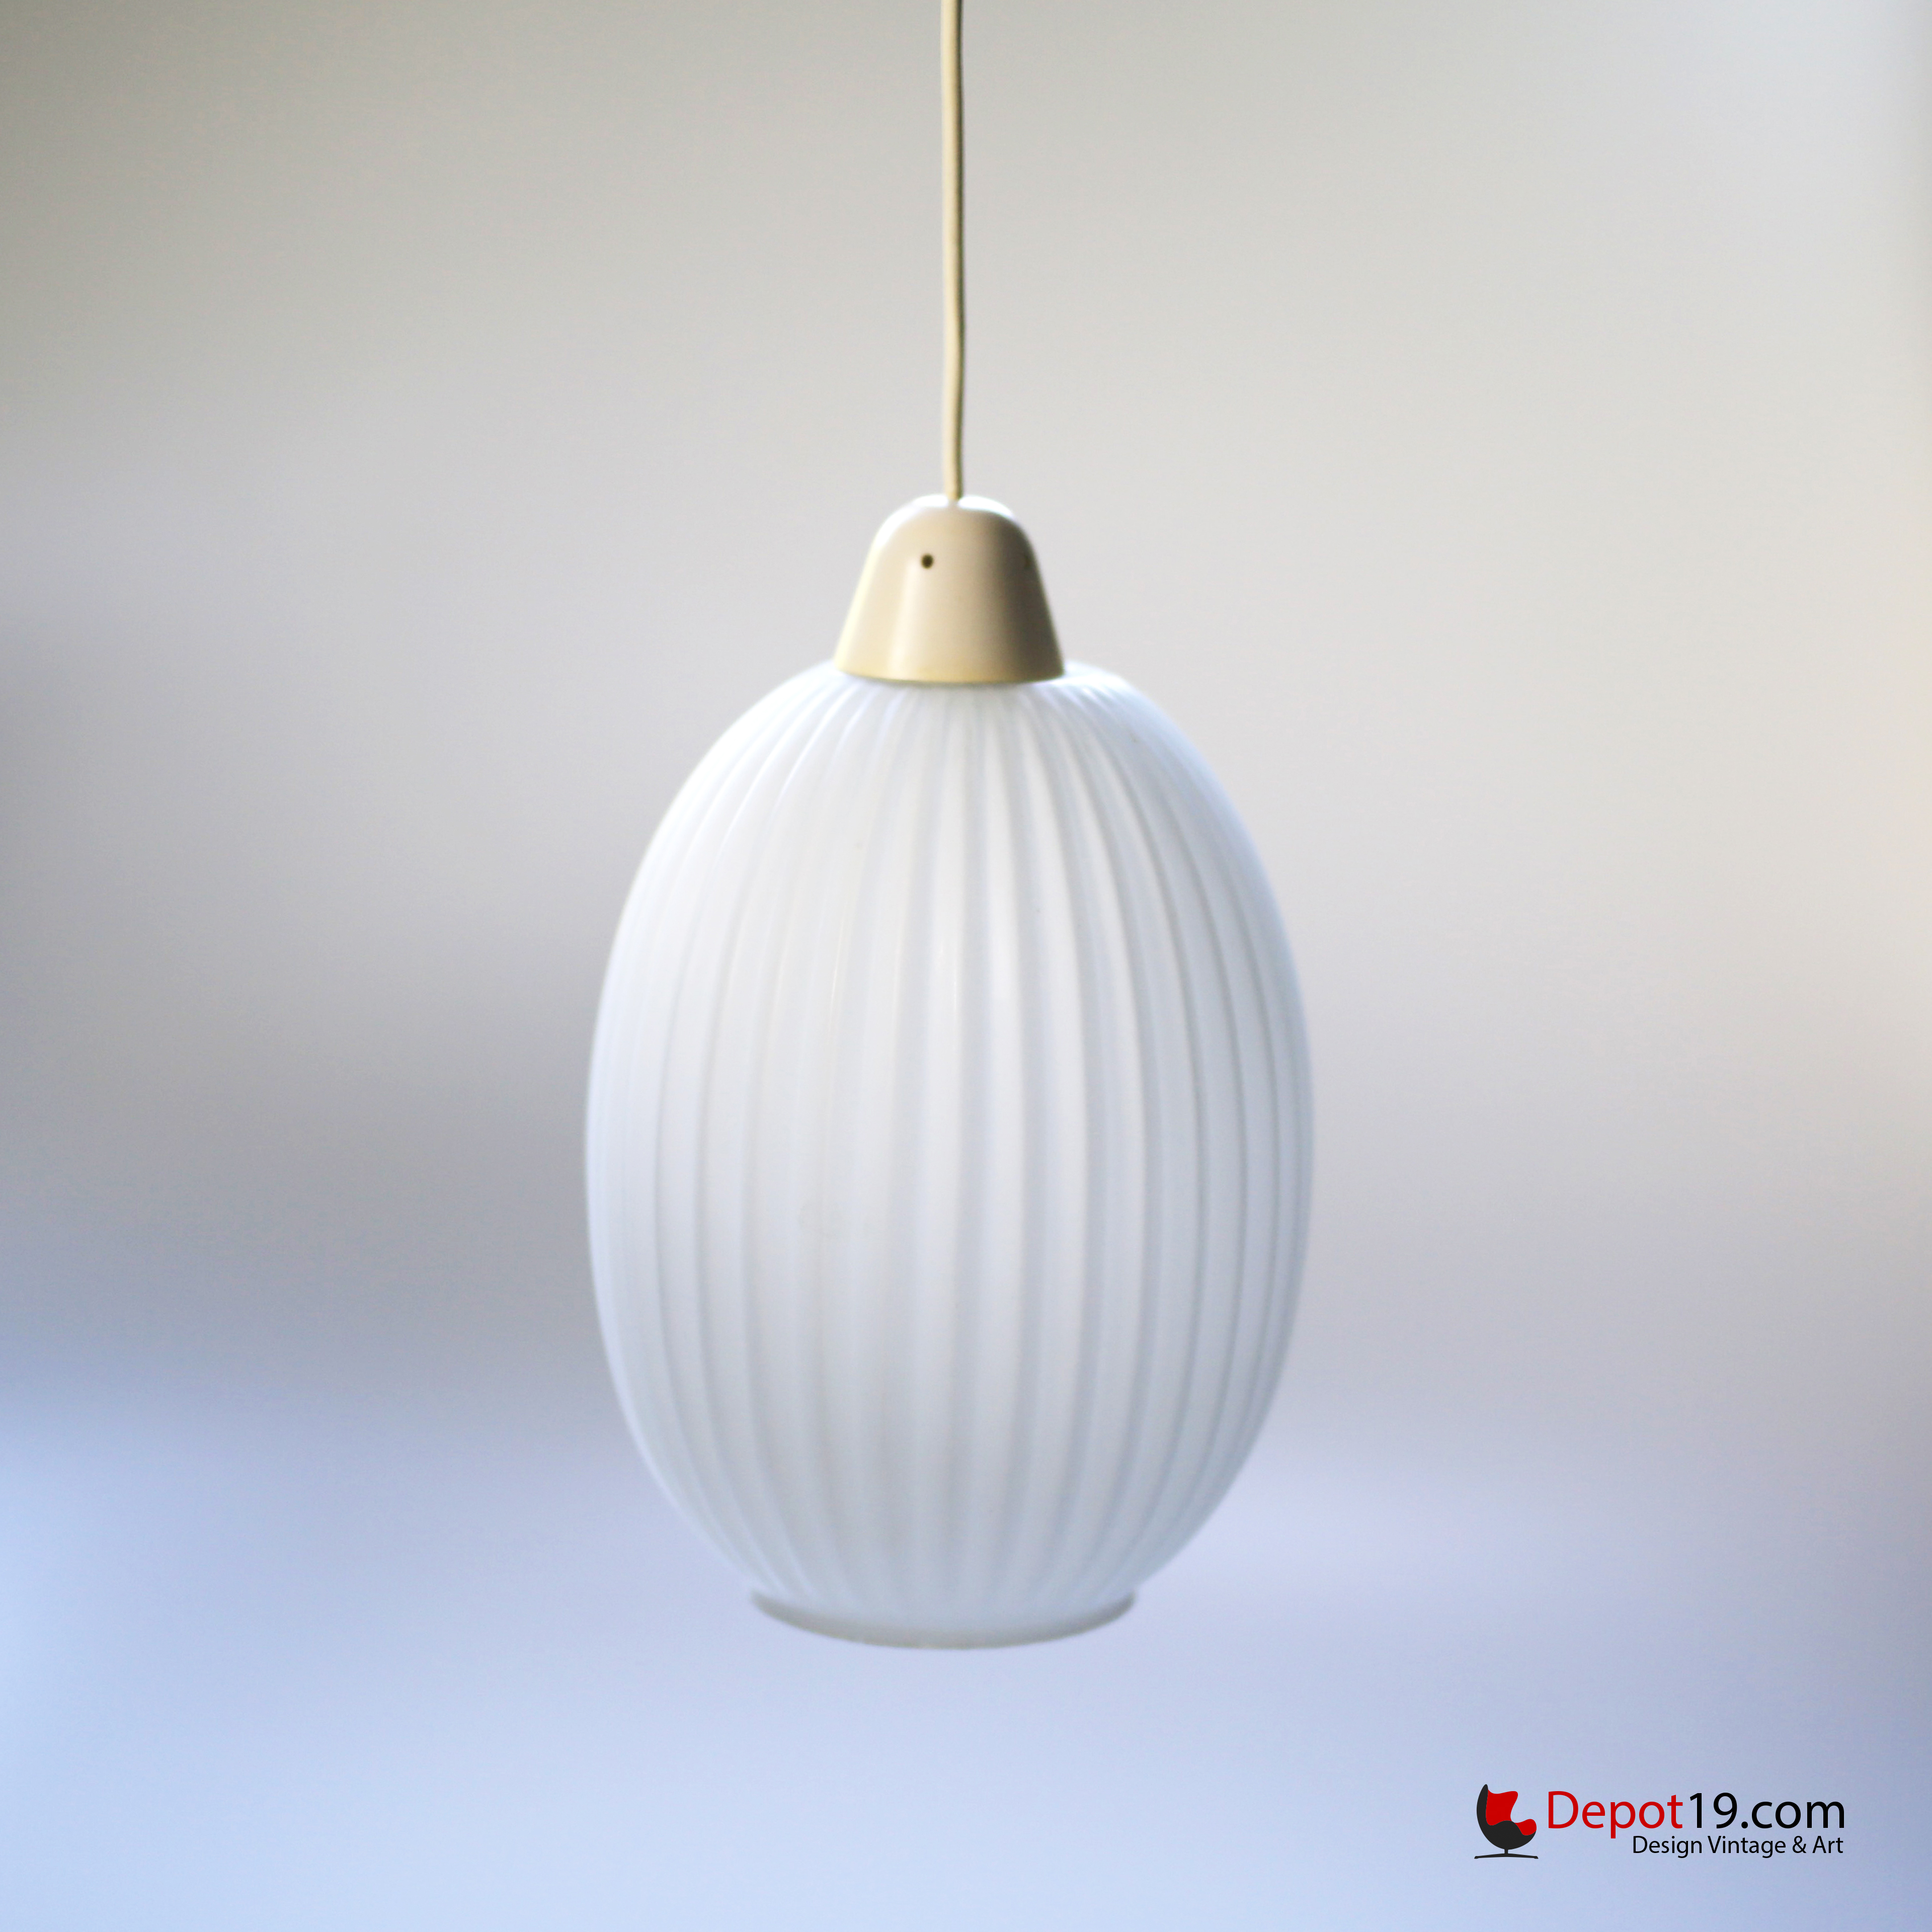 Spiksplinternieuw Vintage design lighting Philips Louis Kalff pendant lamp 1950s SL-28